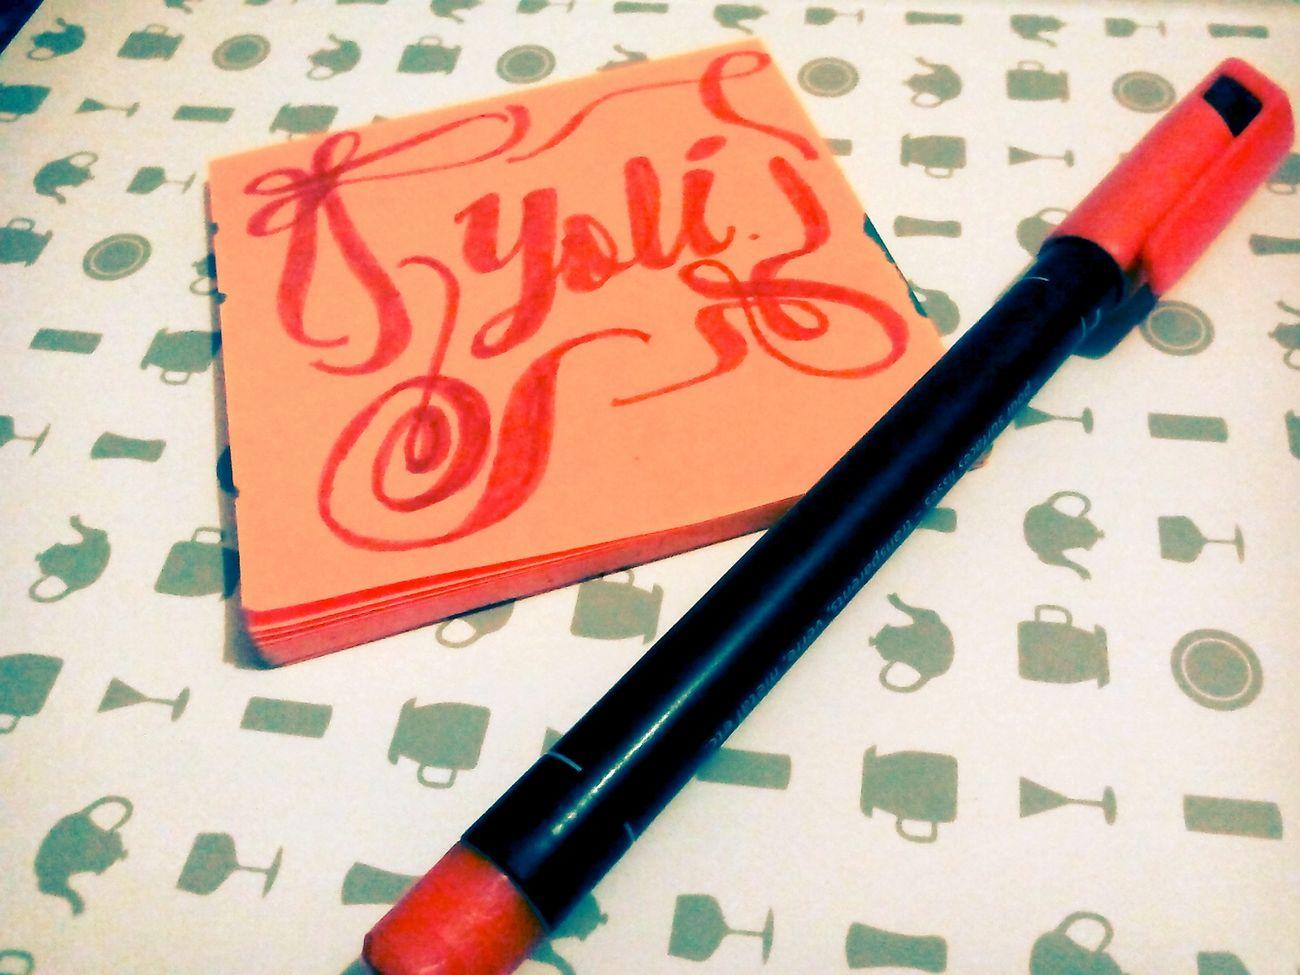 la creatividad vuela Paint Paper Tipography Tipografia Doodle Down